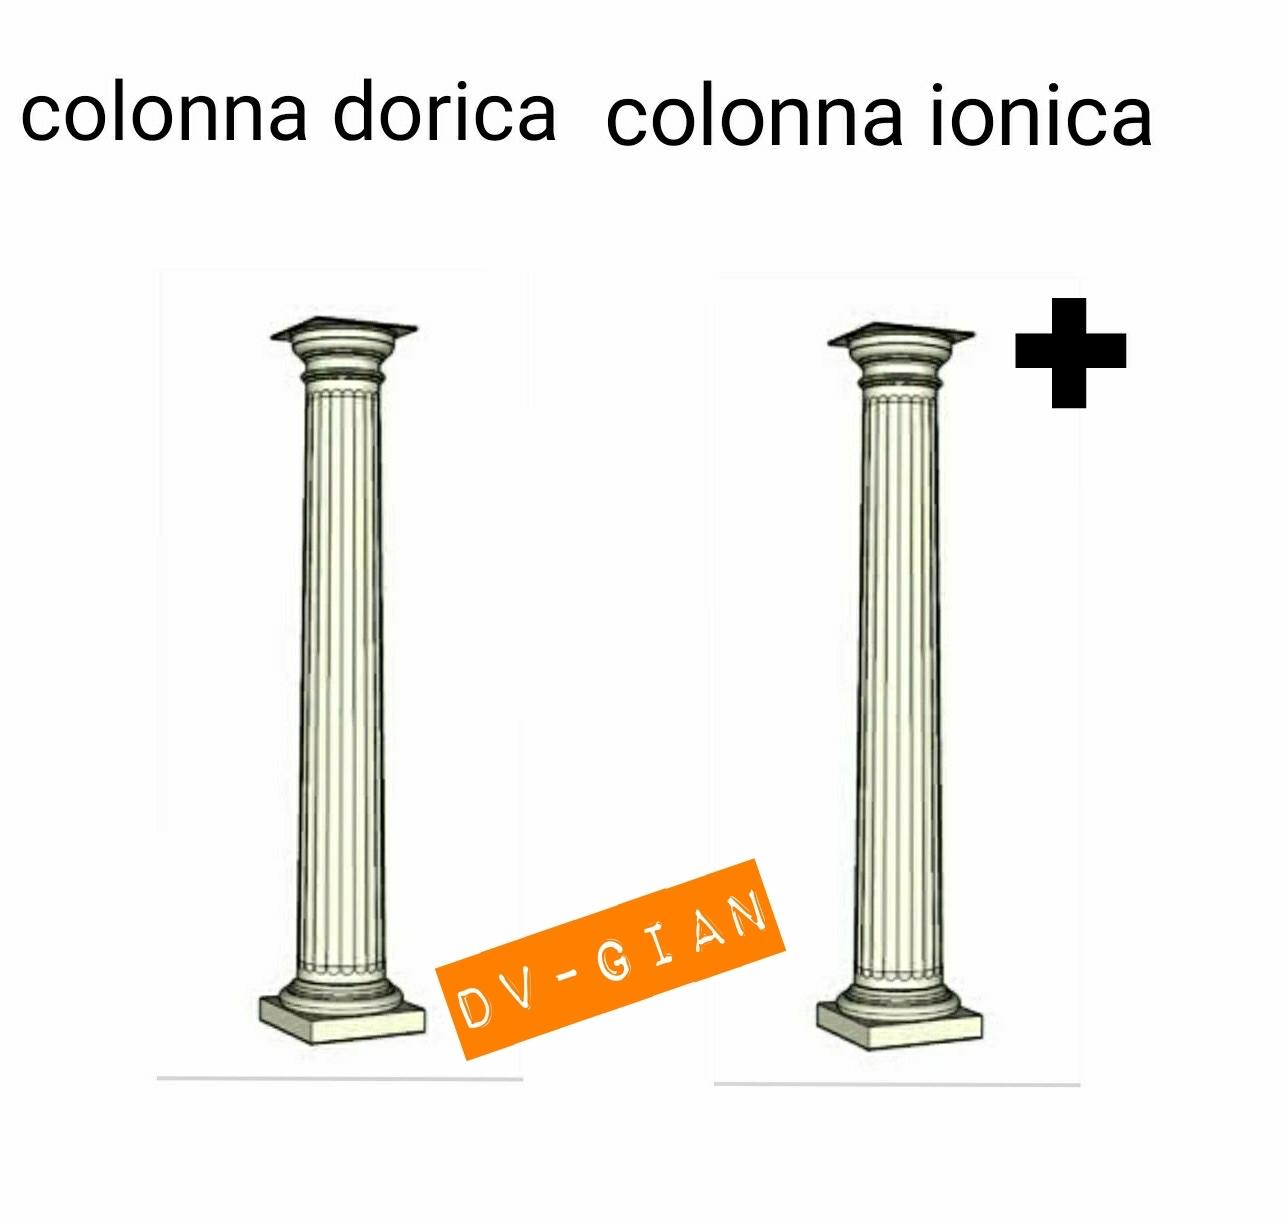 Colonna anionica - meme